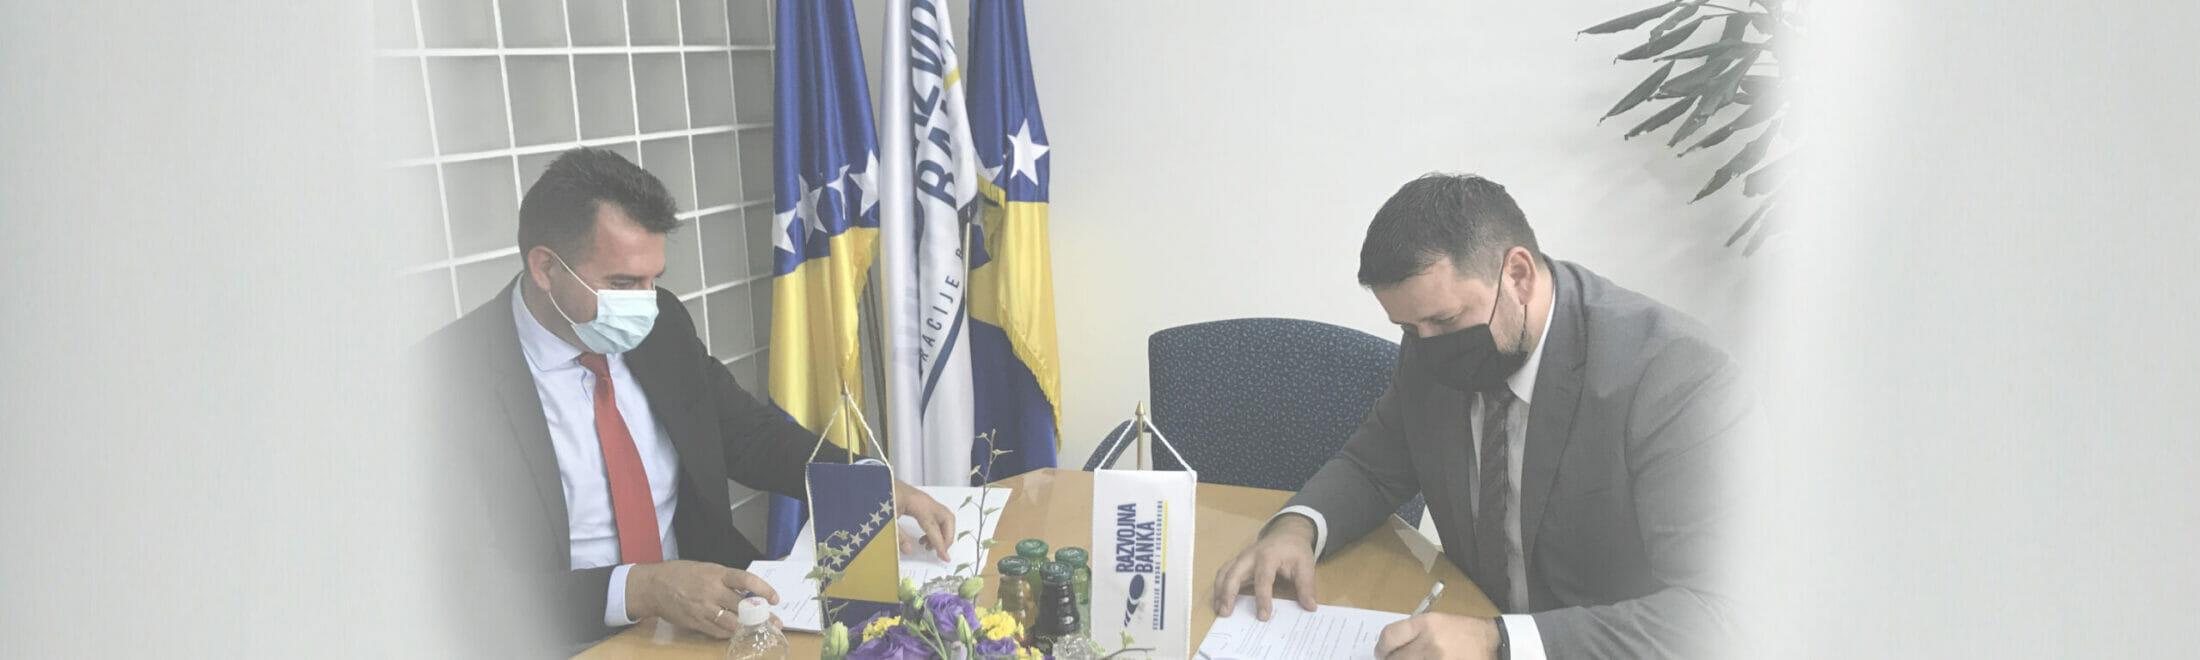 INTESA SANPAOLO BANKA BIH SIGNS AGREEMENT WITH DEVELOPMENT BANK OF FBIH ON USING GUARANTEE FUND